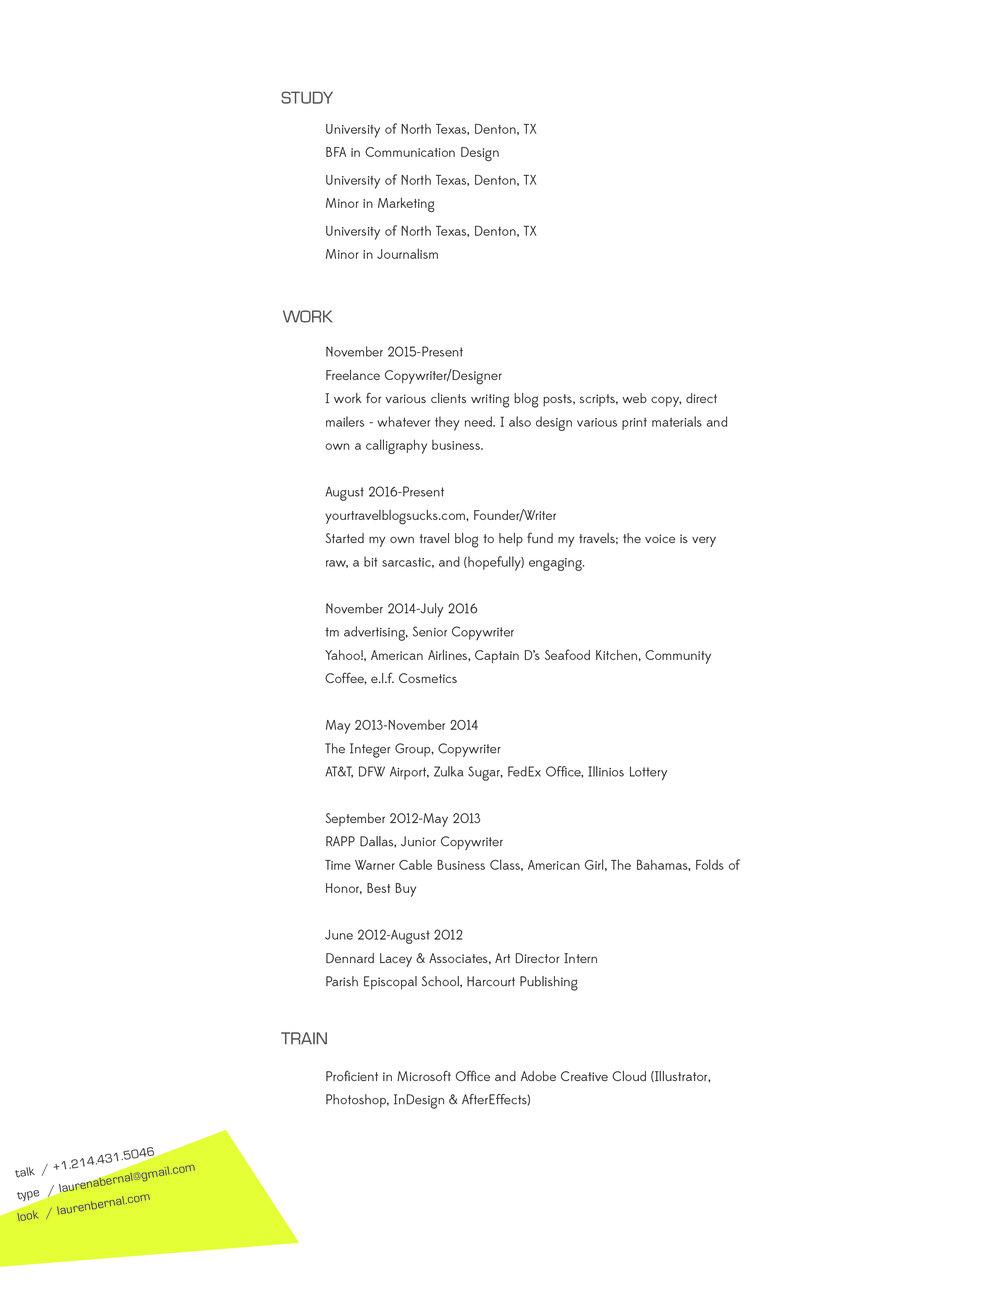 Resume_1010-01.jpg